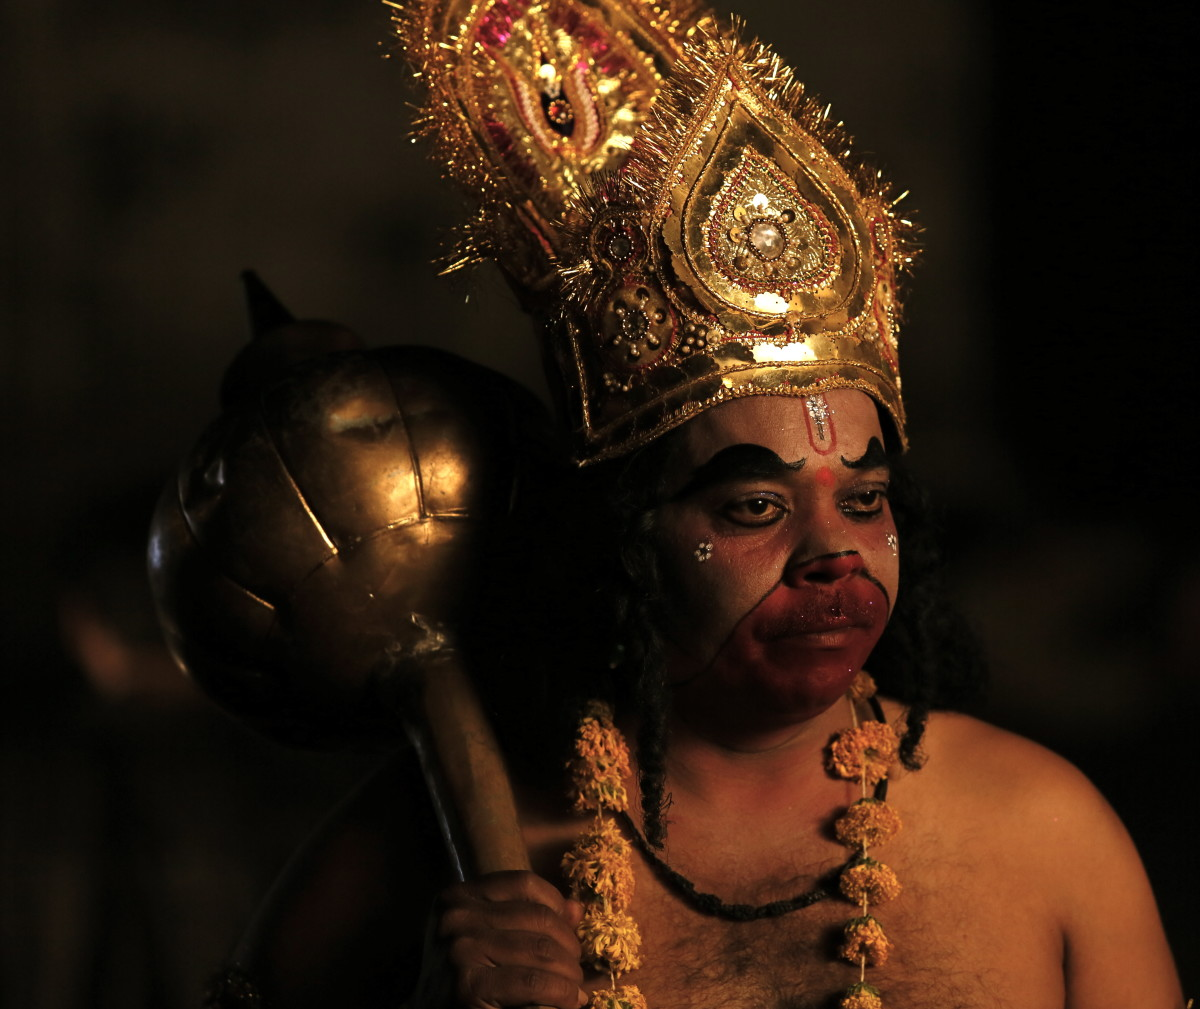 An actor dressed as Hanuman